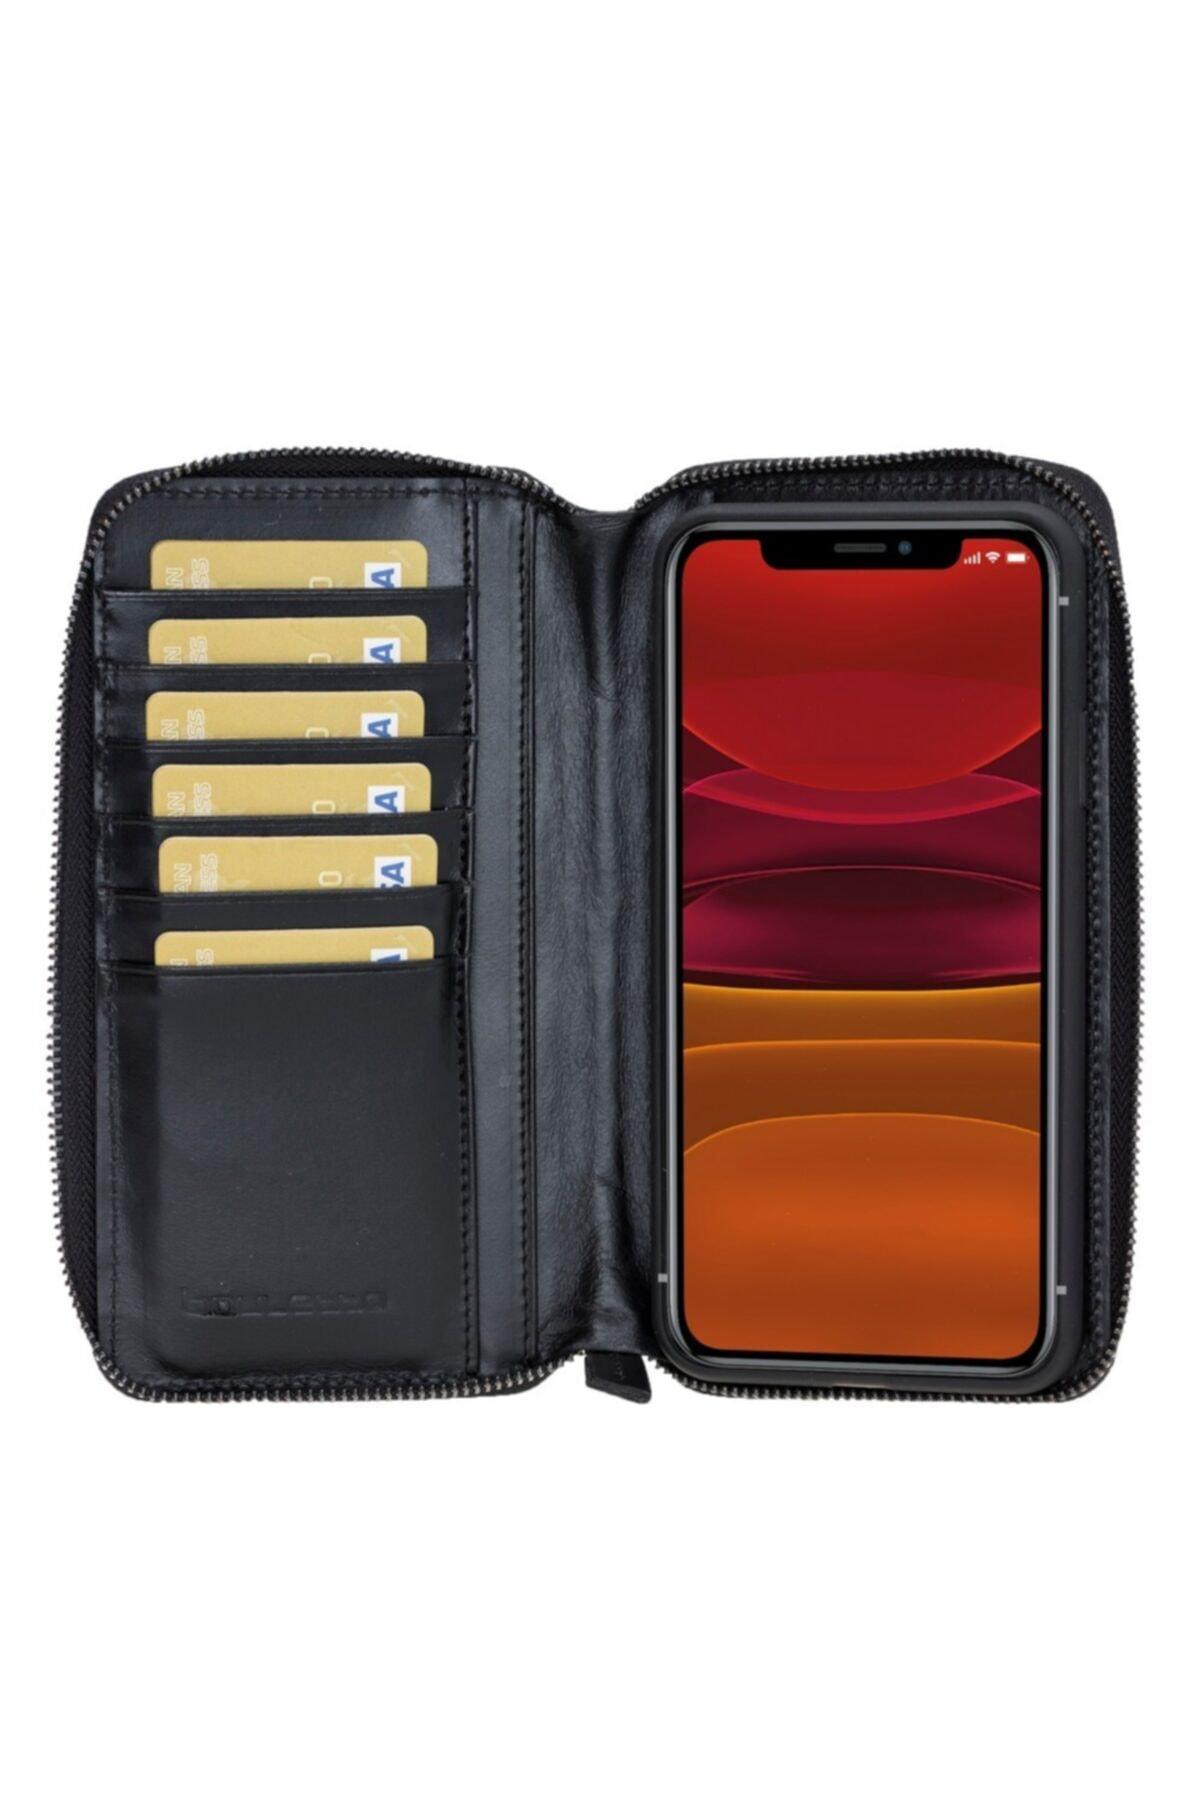 Bouletta Mw Pouch Deri Telefon Kılıfı Iphone 11 Promax Rst1 Siyah Rfıd 1